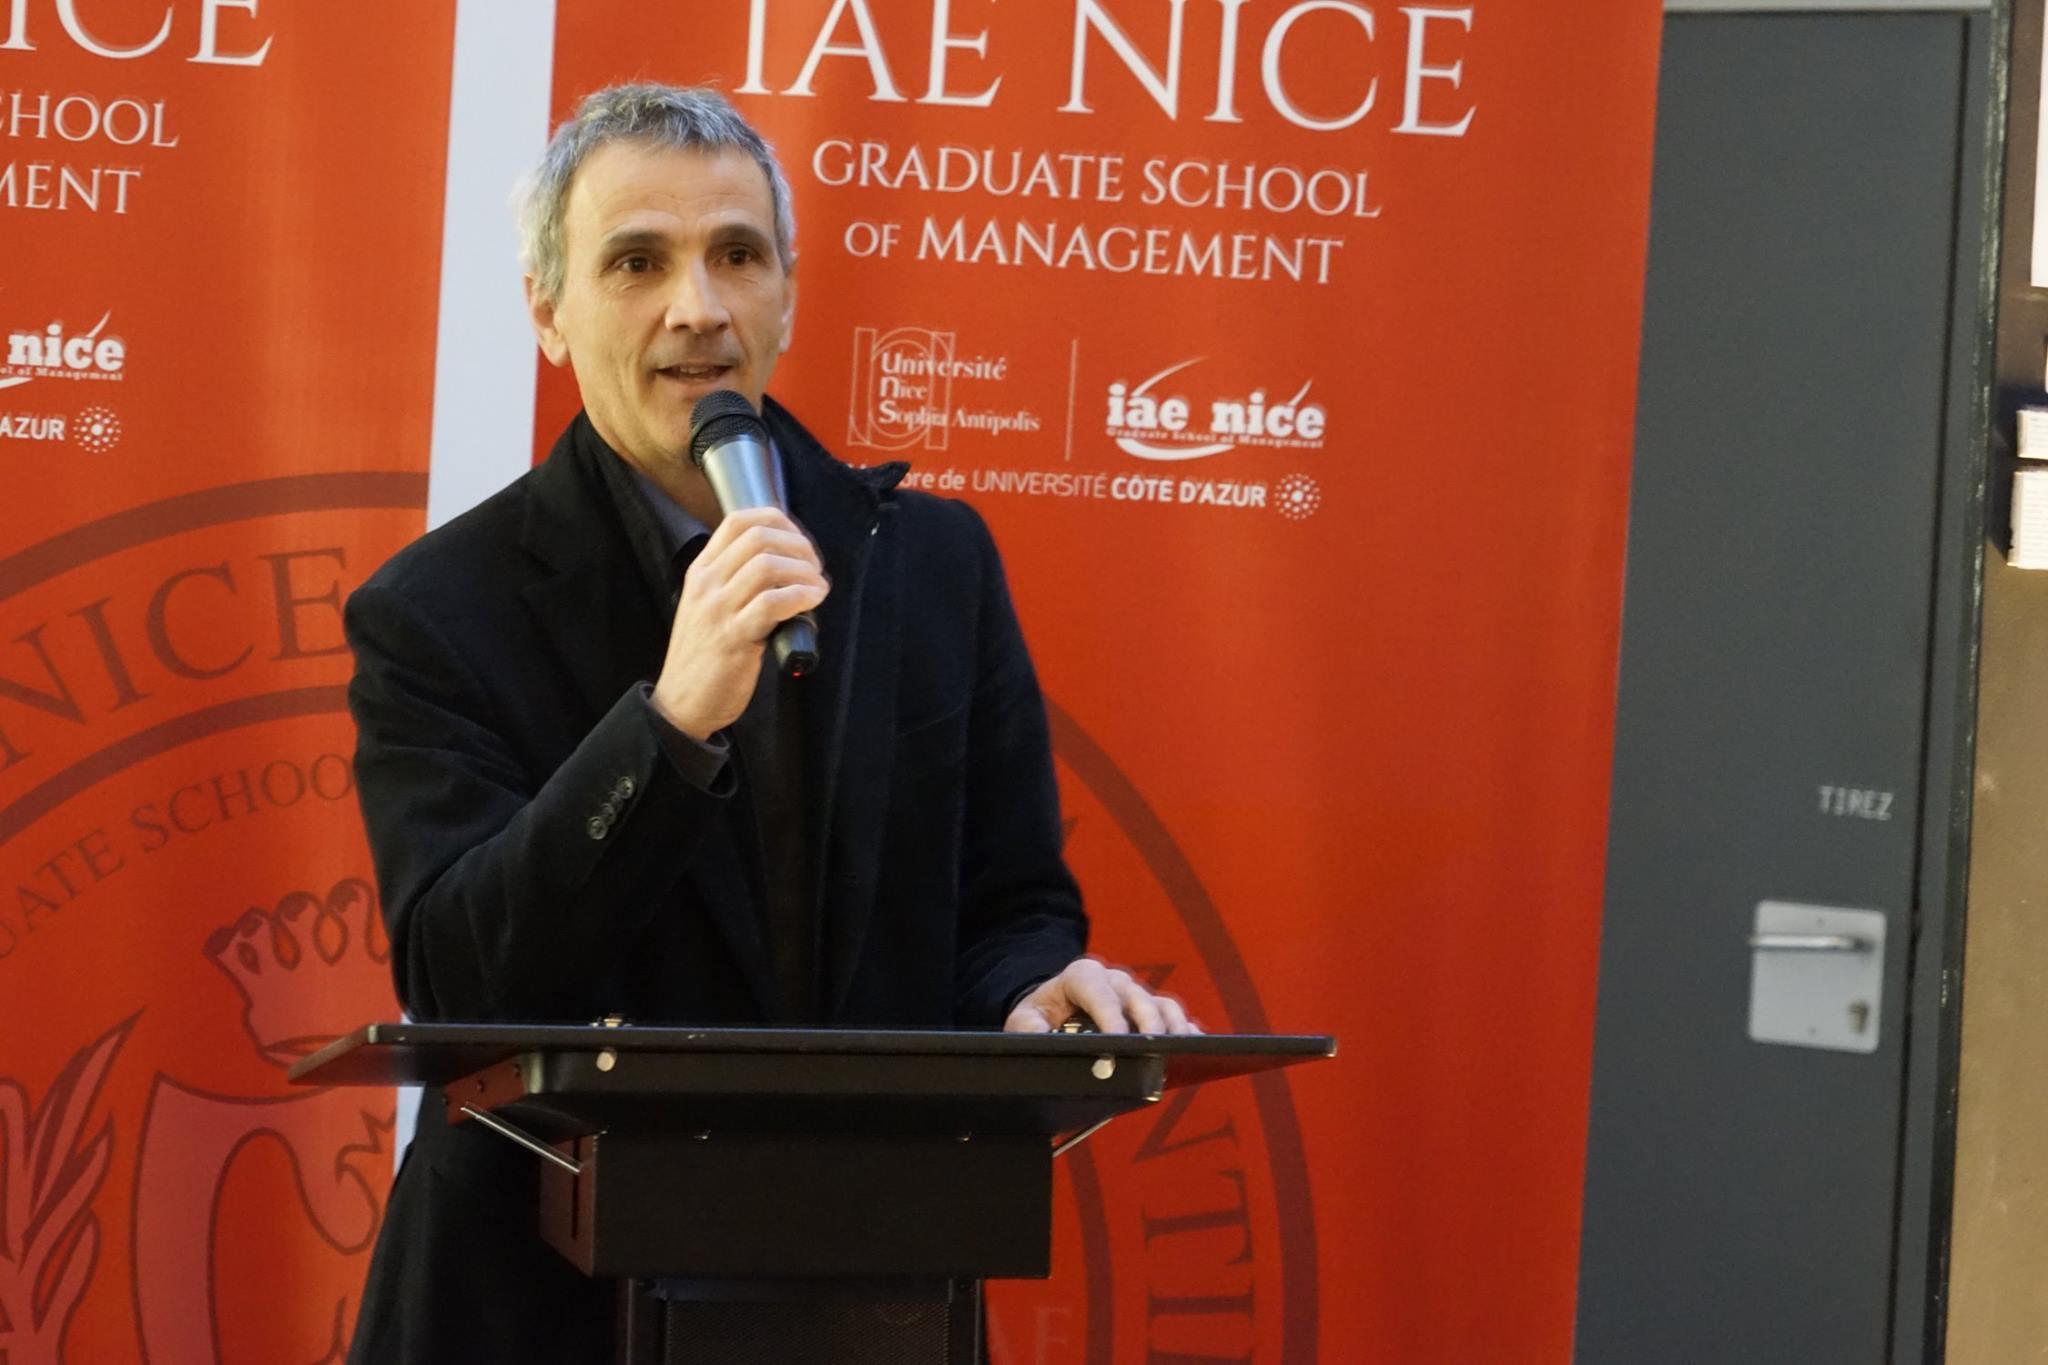 Directeur du Master MATC, Jean-Baptiste Pisano